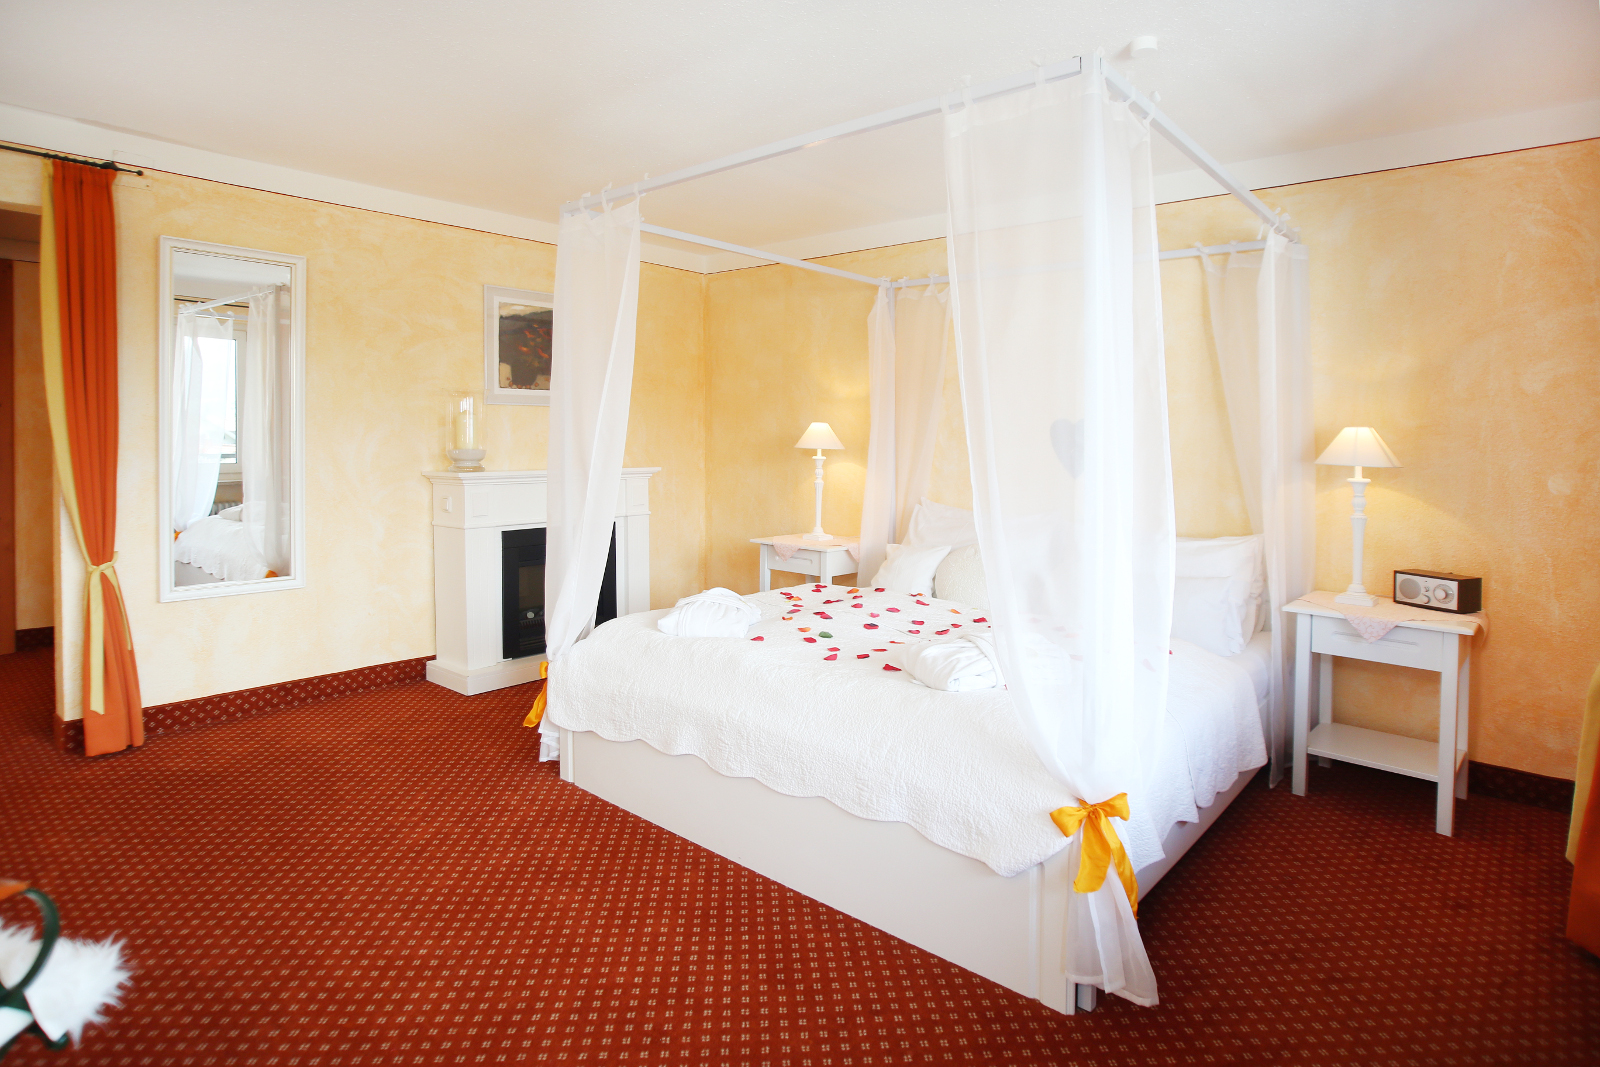 Romantik Hotel Sonne Bad Hindelang Hotelbewertung